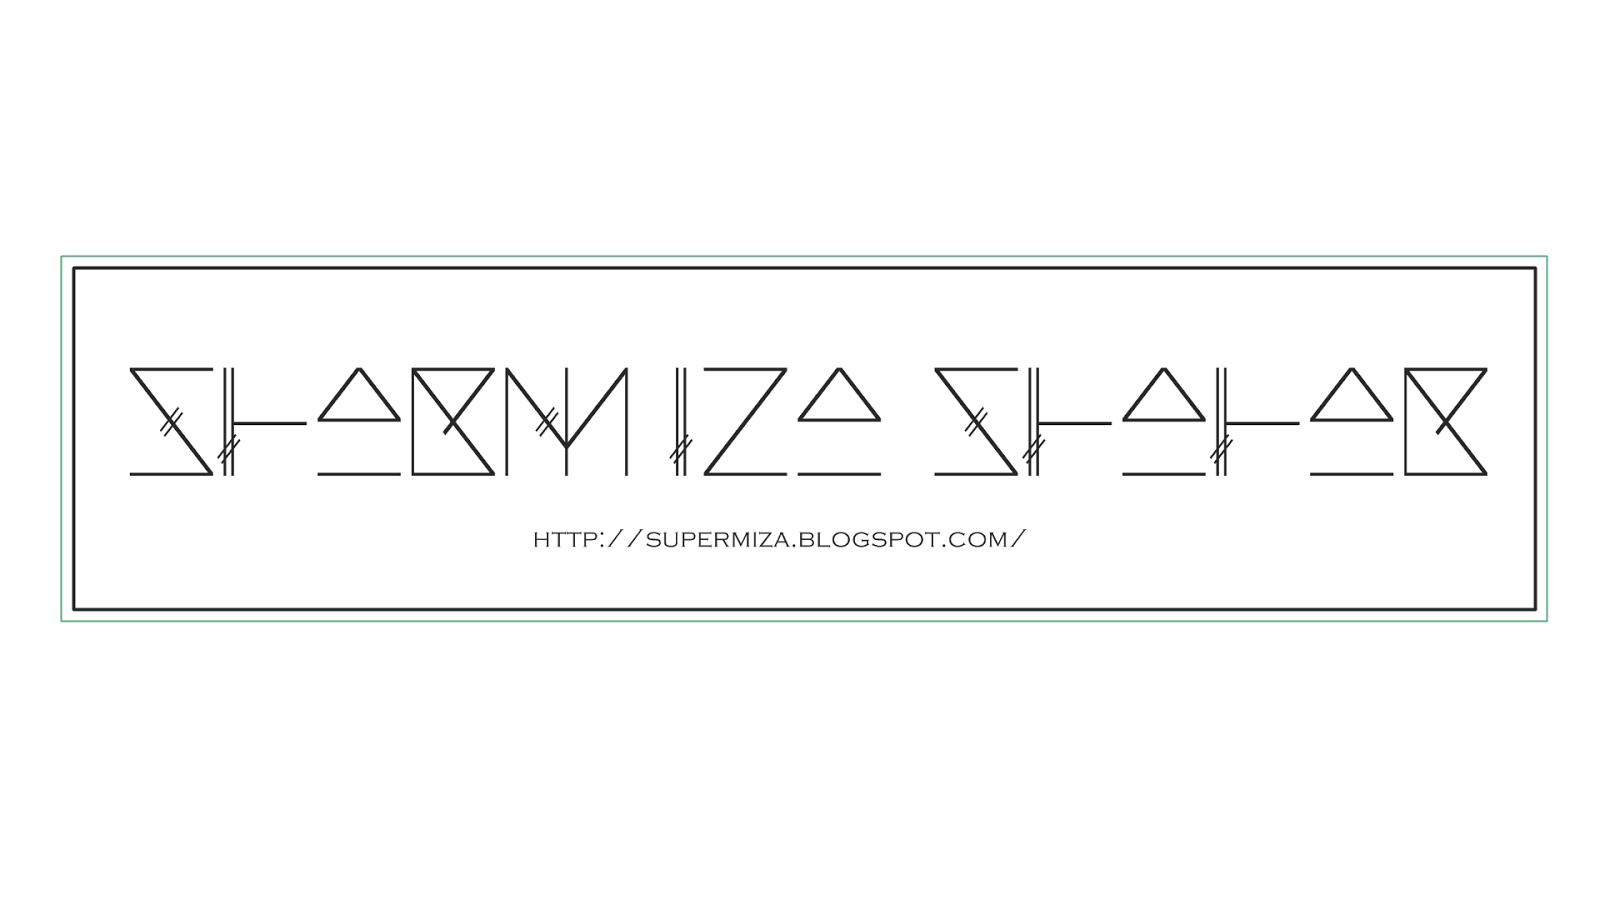 Sharmiza Shahar